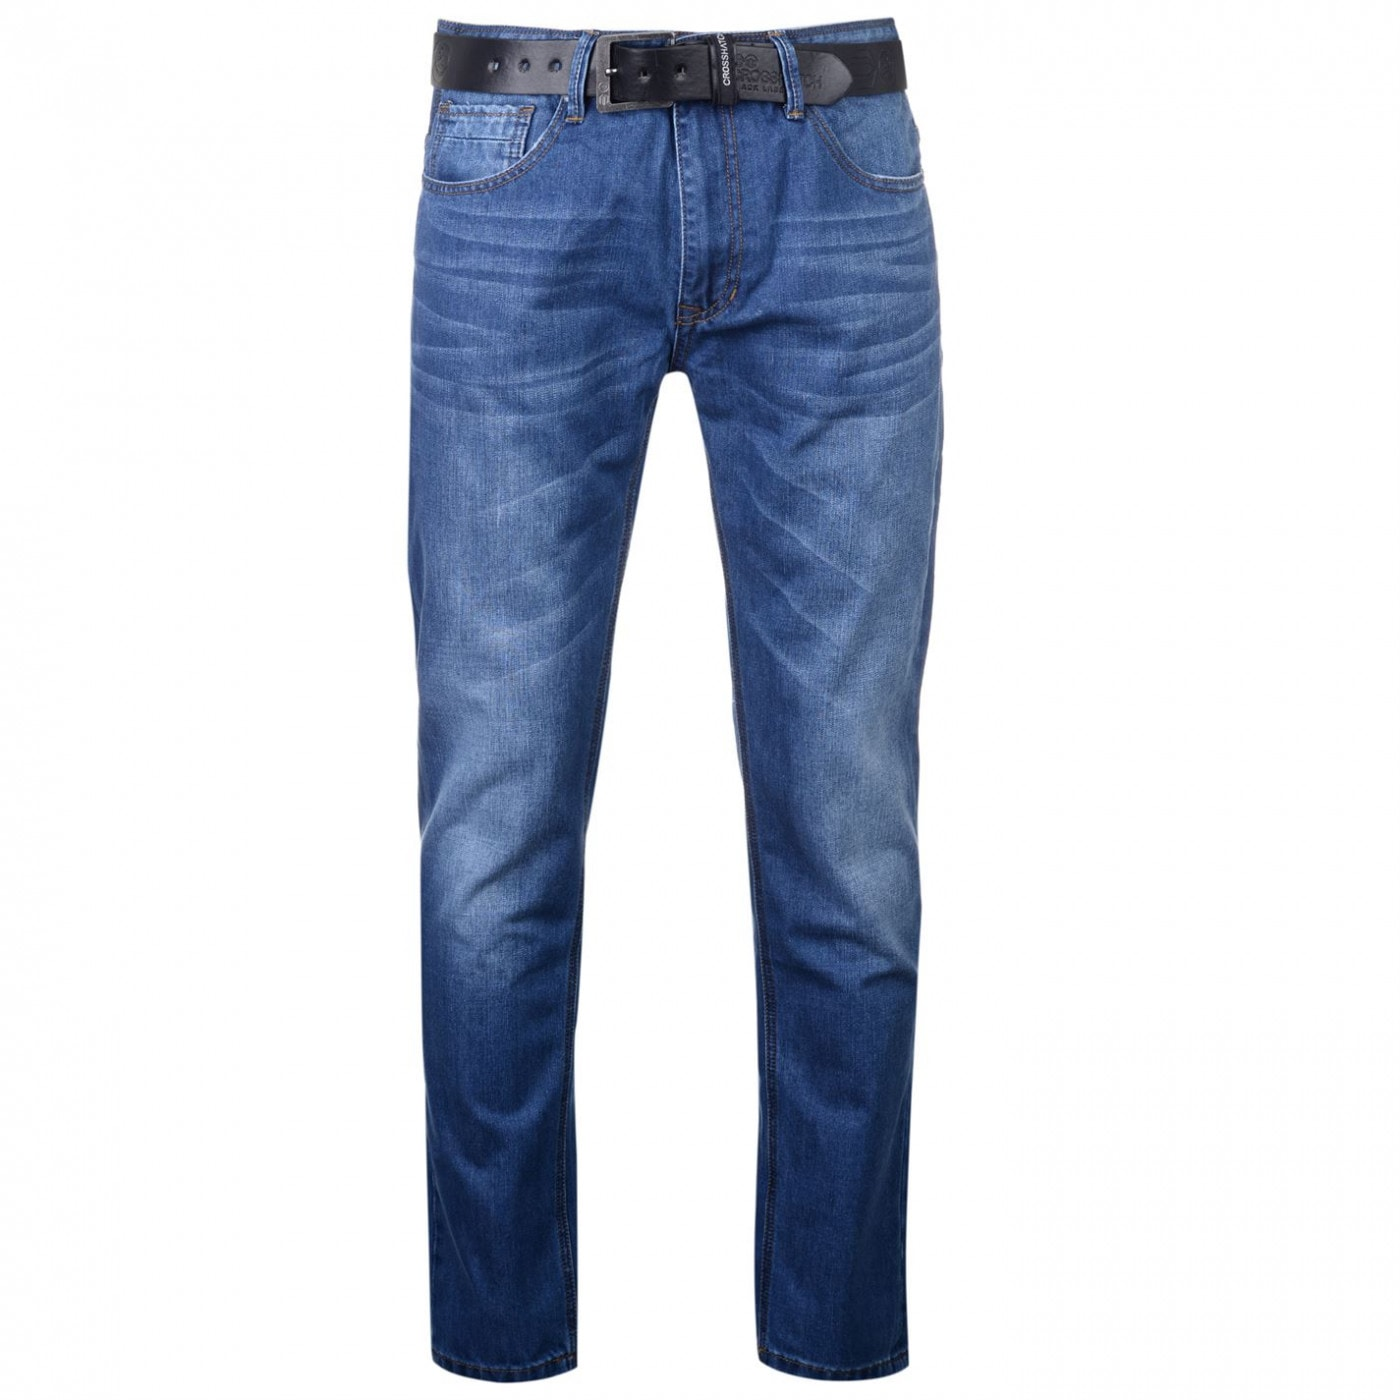 Crosshatch Lartoons Belted Jeans Mens